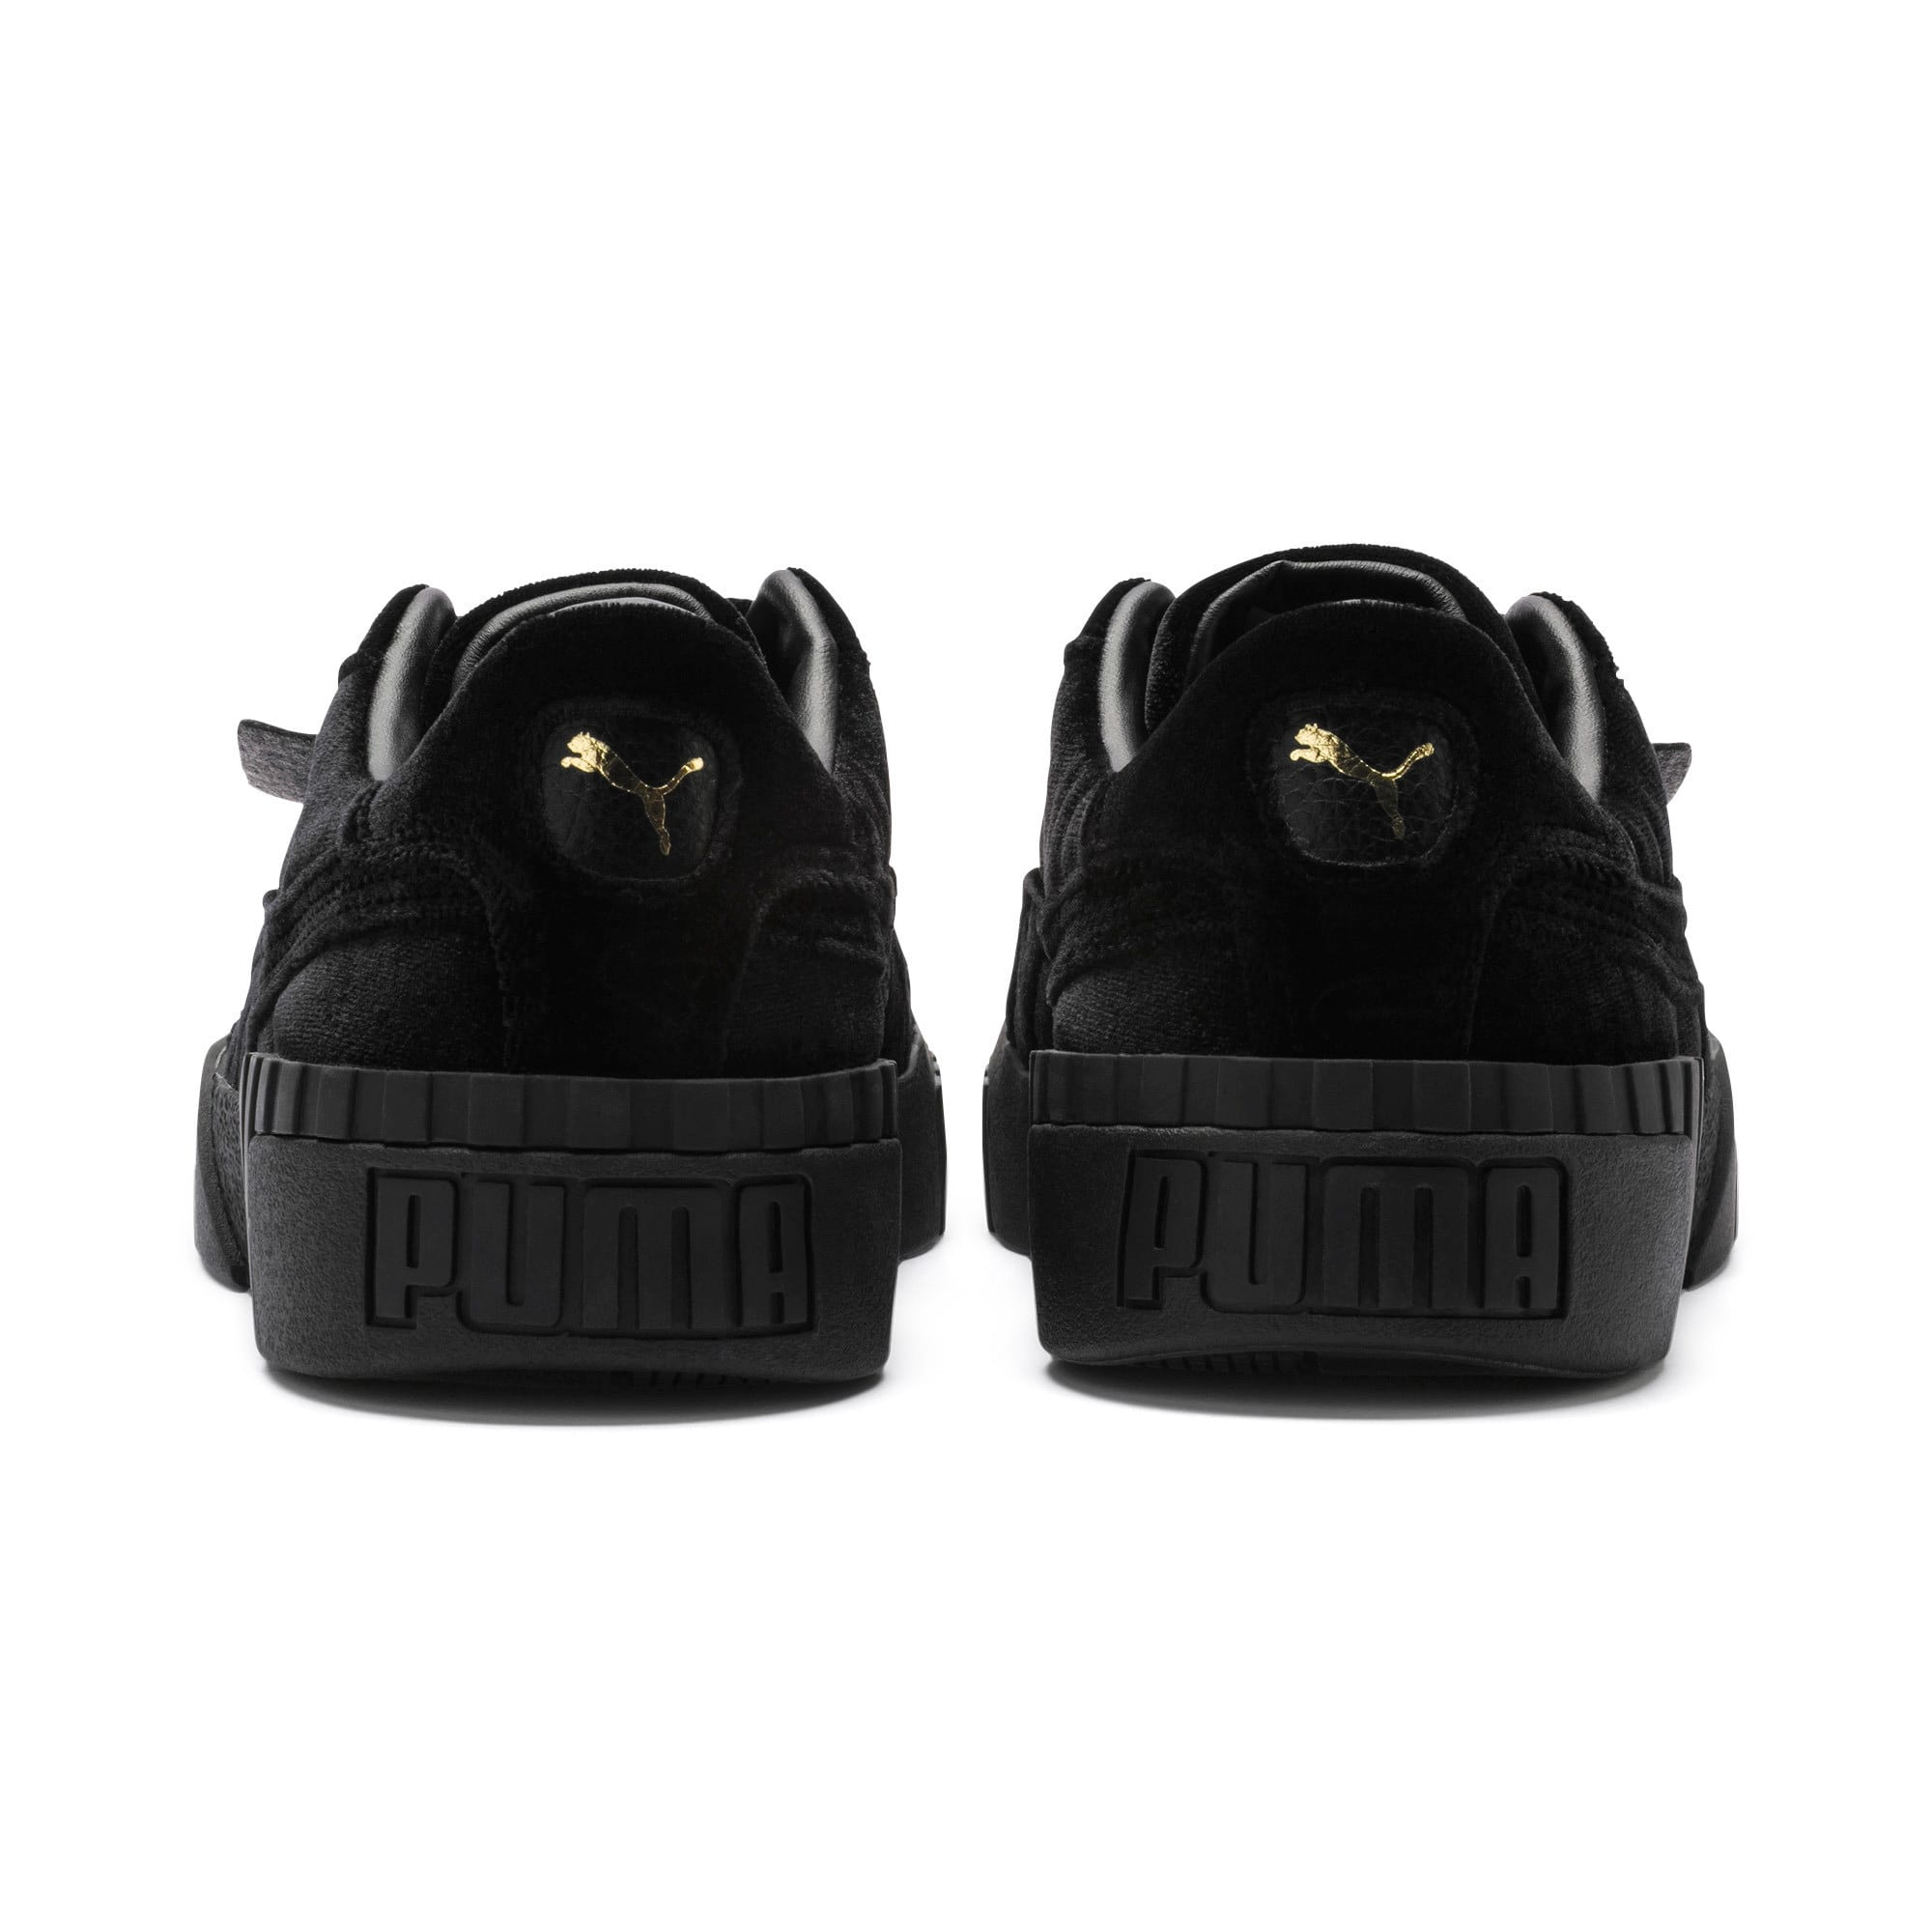 Thumbnail 4 of Cali Velvet Women's Sneakers, Puma Black-Puma Black, medium